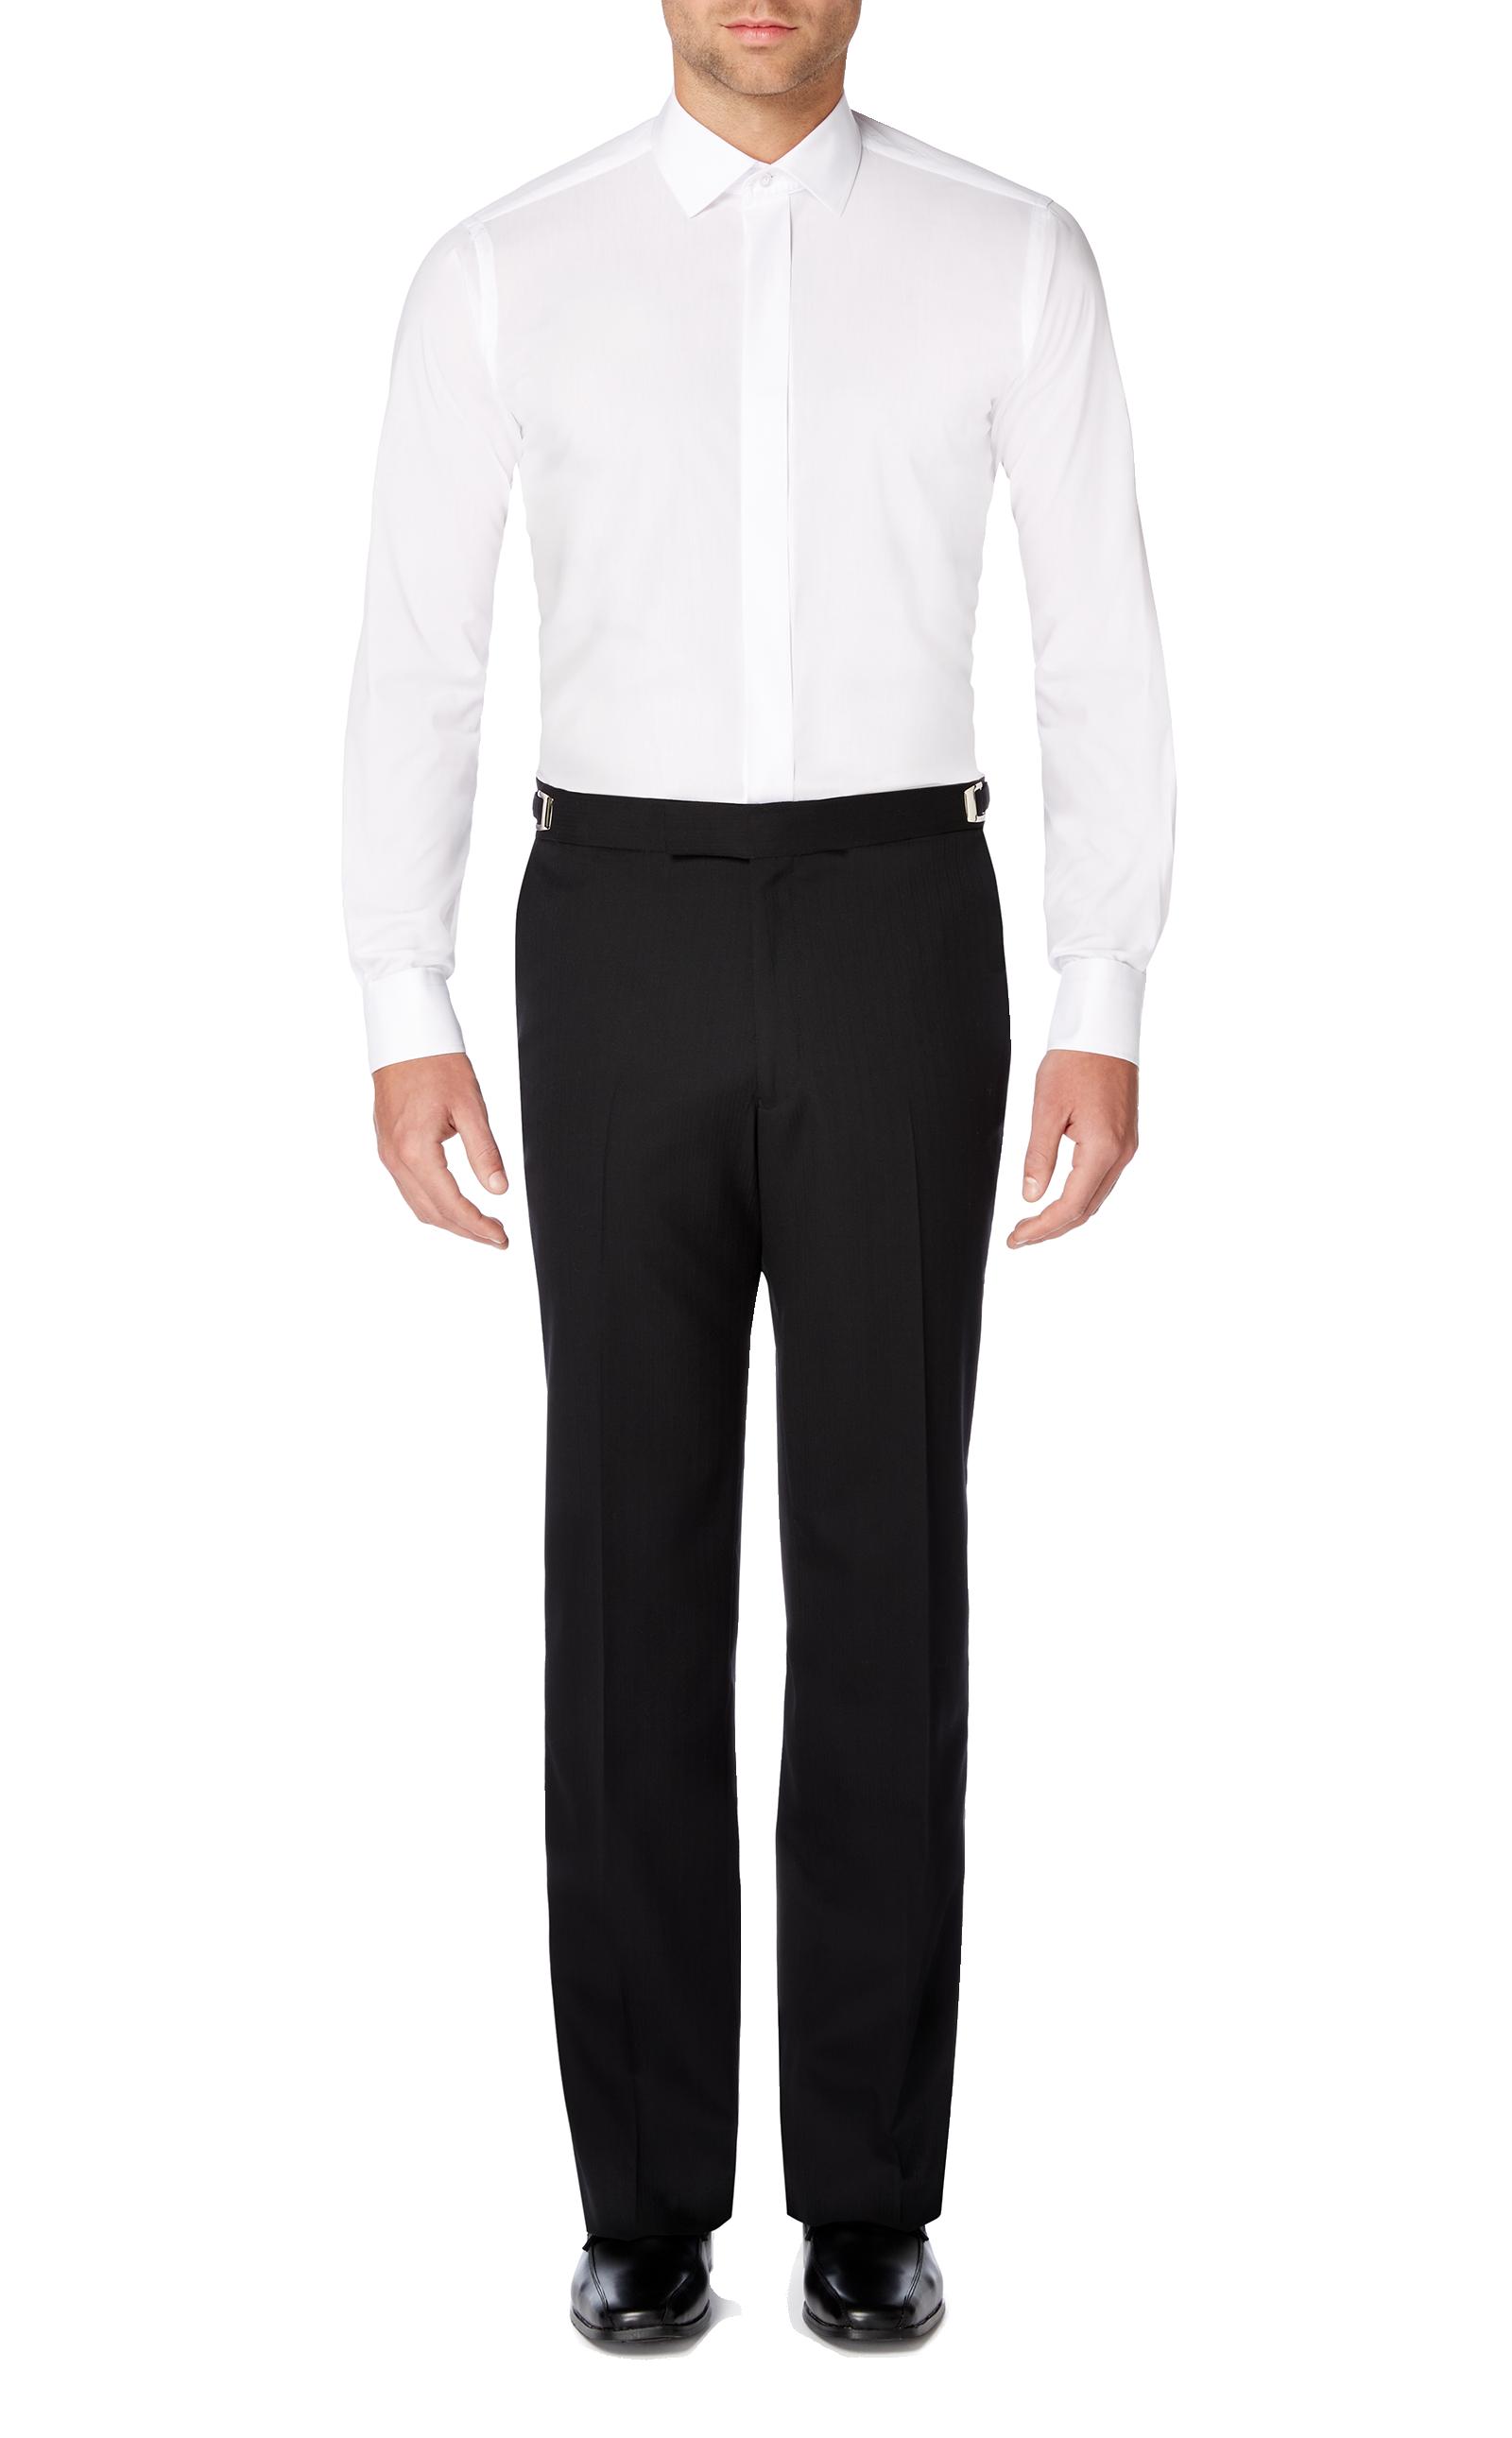 Build Your Wedding Tuxedo JCPenney Tuxedo Rental